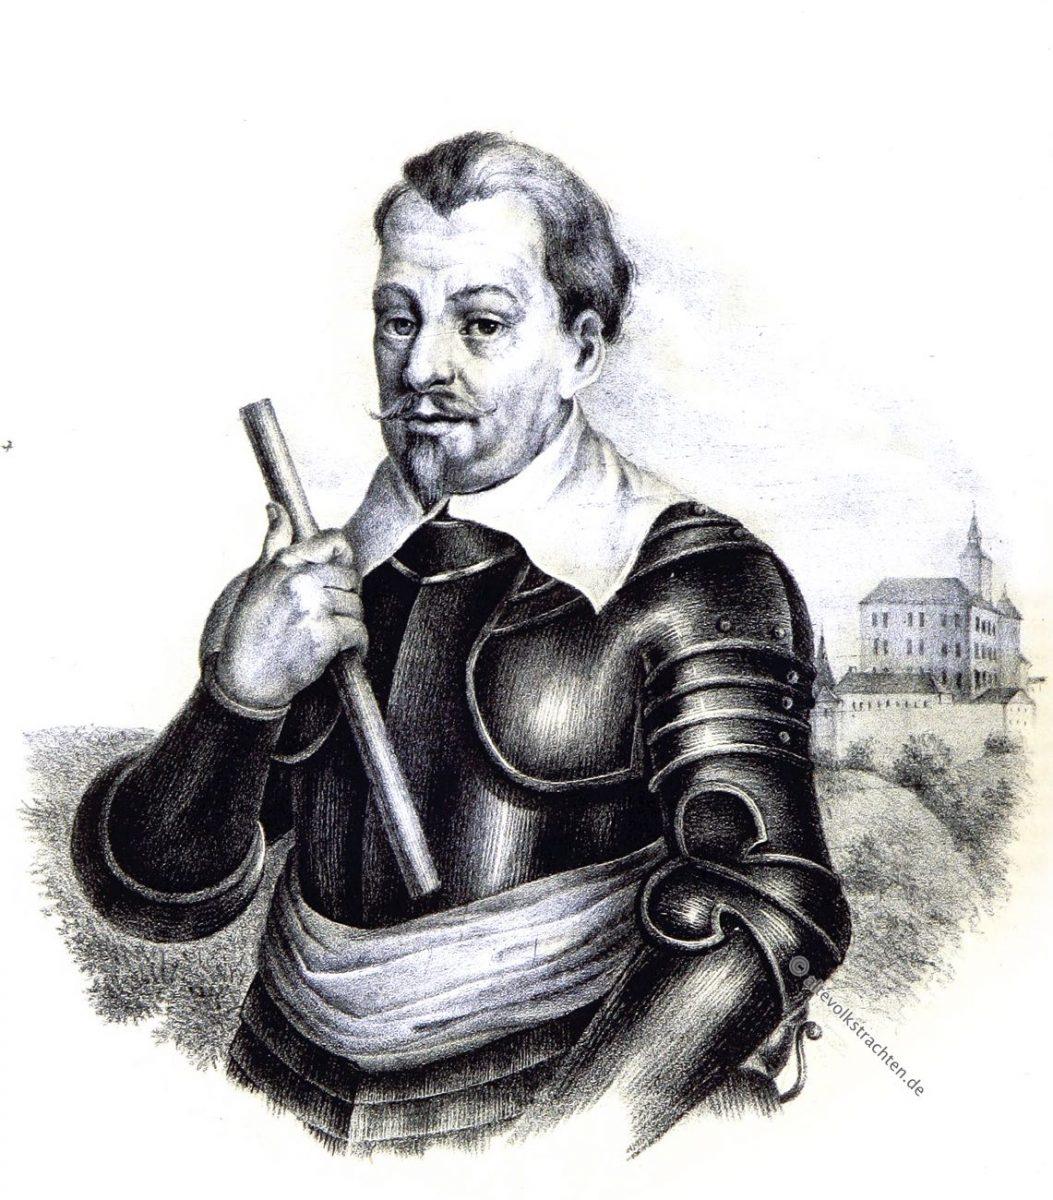 Wallenstein, Dreißigjähriger Krieg, Oberbefehlshaber, Stratege, Kampfkunst, Uniform, General, Barock